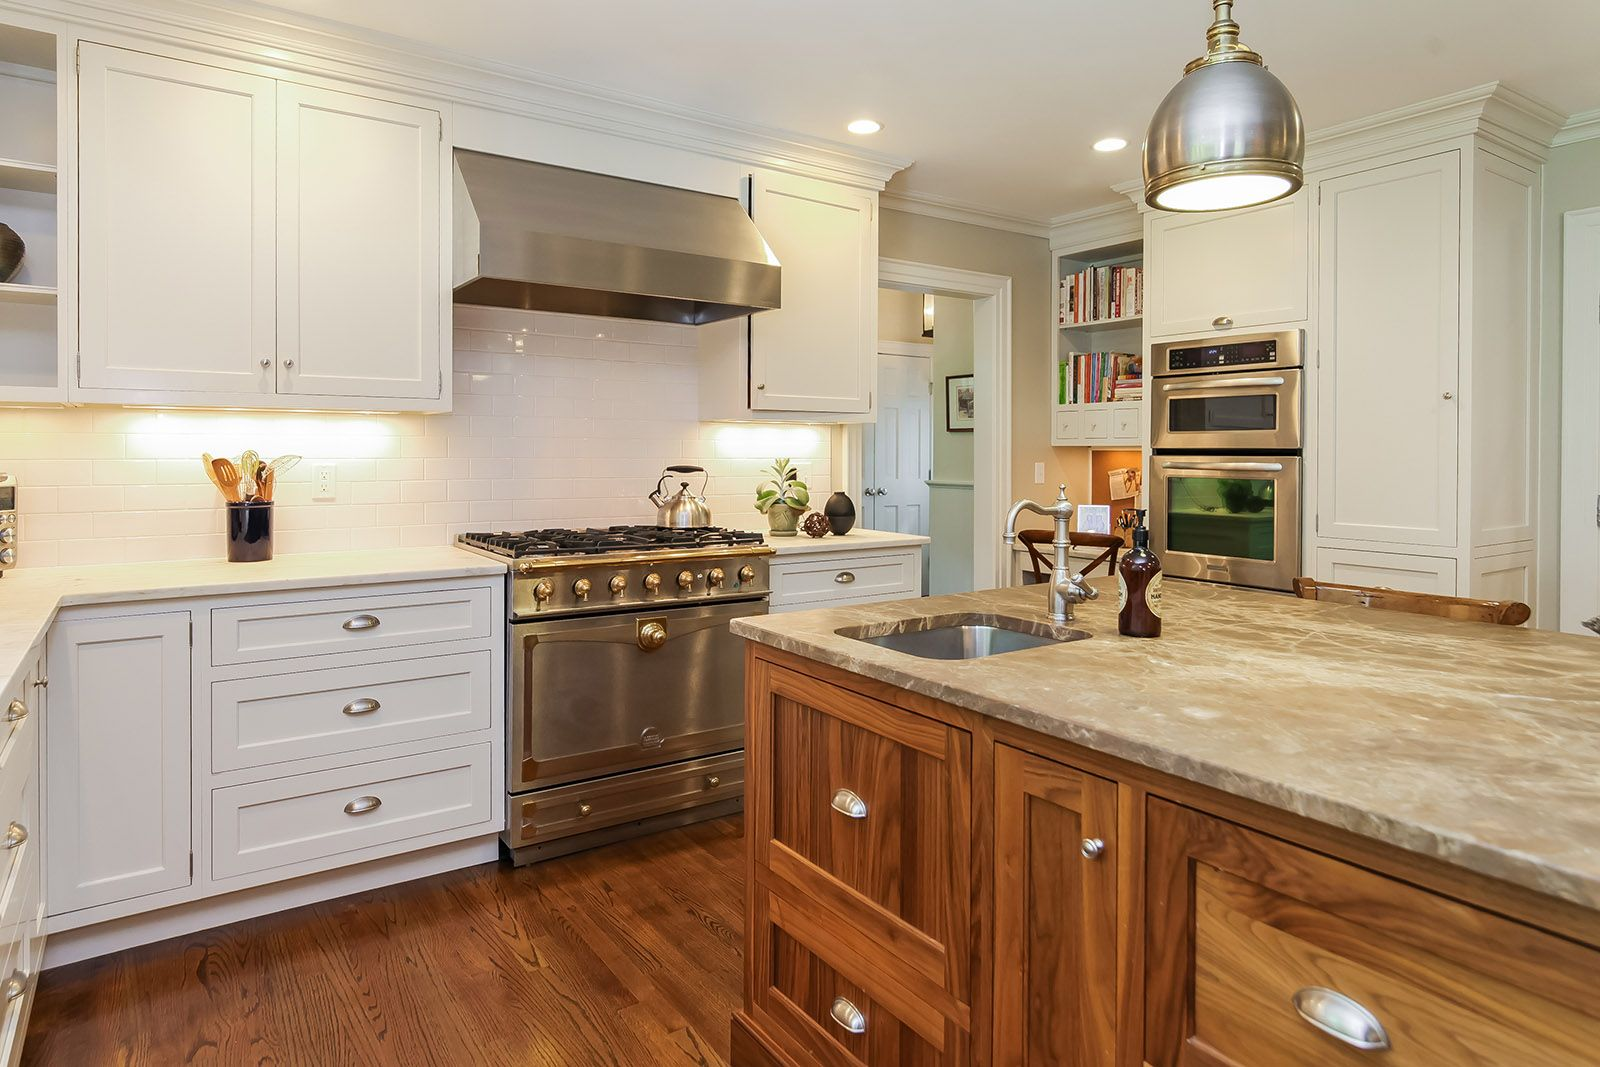 Kitchen cabinets summit nj - 40 Wildwood Lane Wildwood Lane Summit Nj For Sale Beautiful Construction